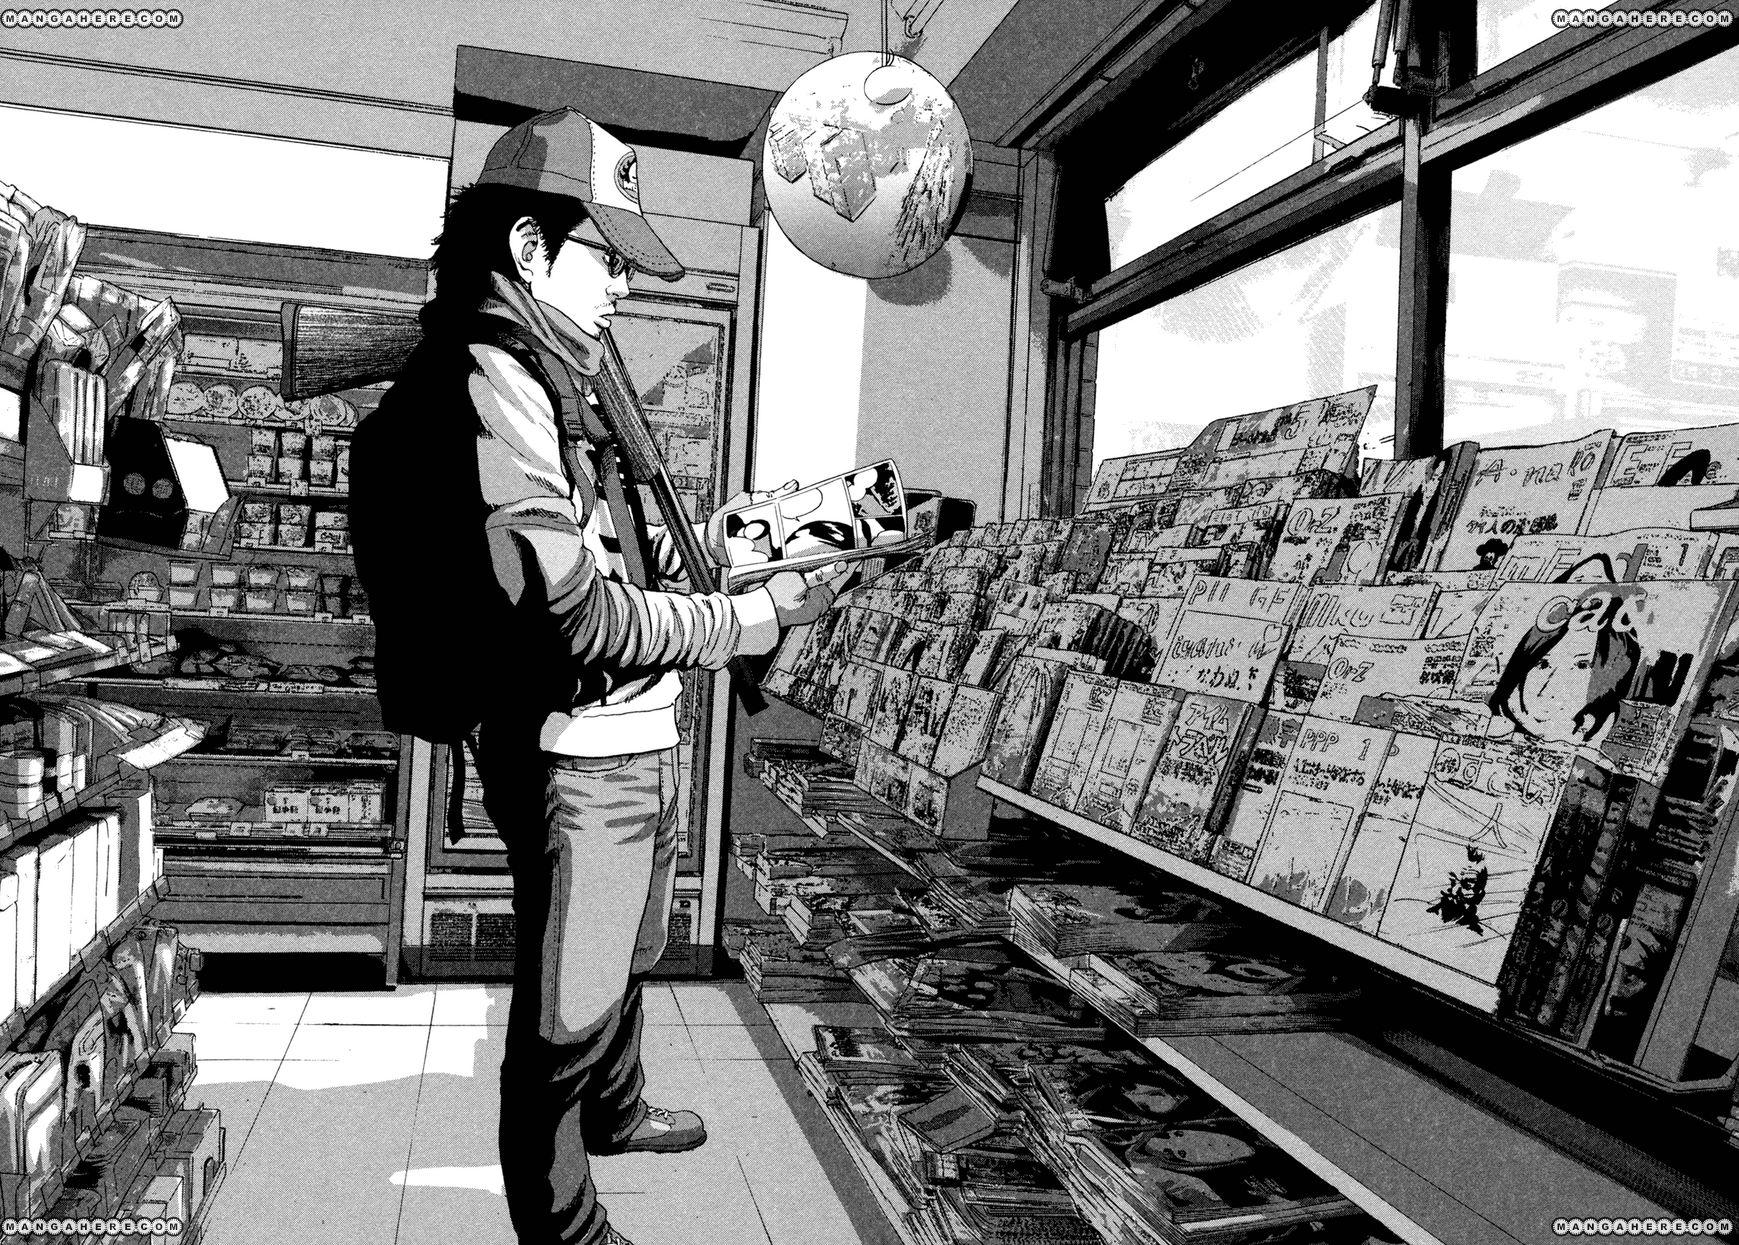 http://a.mhcdn.net/store/manga/5870/05-063.0/compressed/viamahero_v006p096-097.jpg?v=1331267643